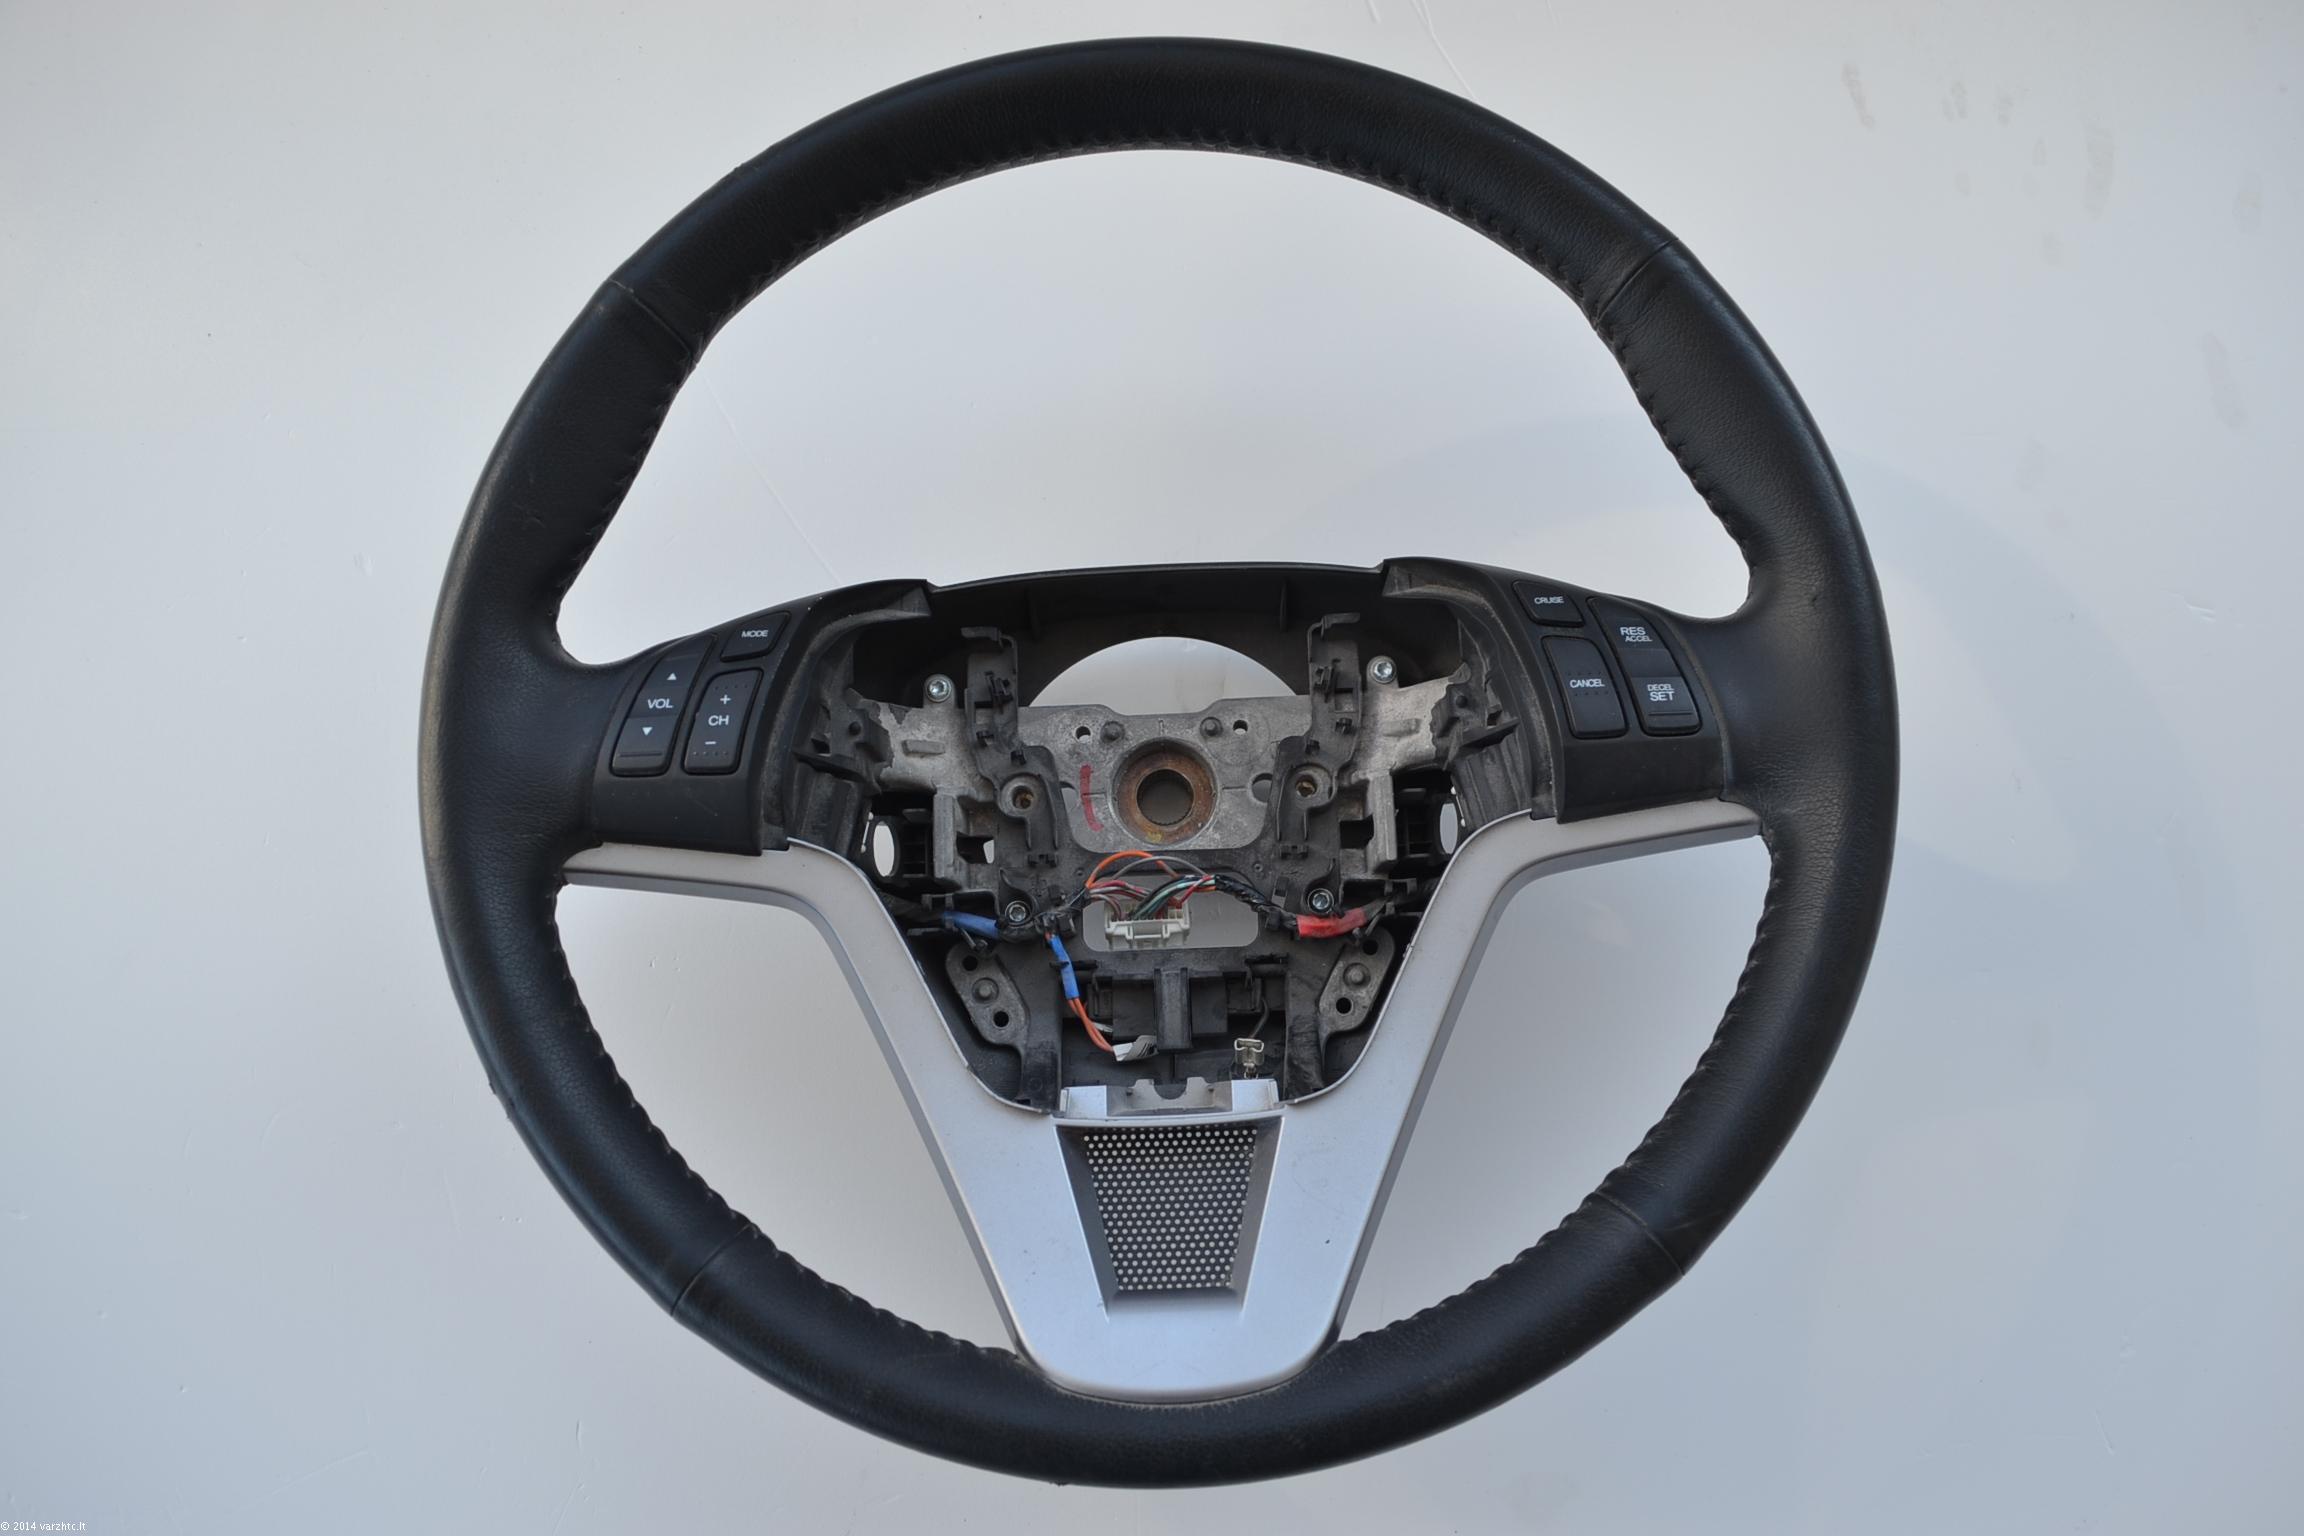 honda crv cr v 2008 steering wheel multi function cruise control ebay. Black Bedroom Furniture Sets. Home Design Ideas